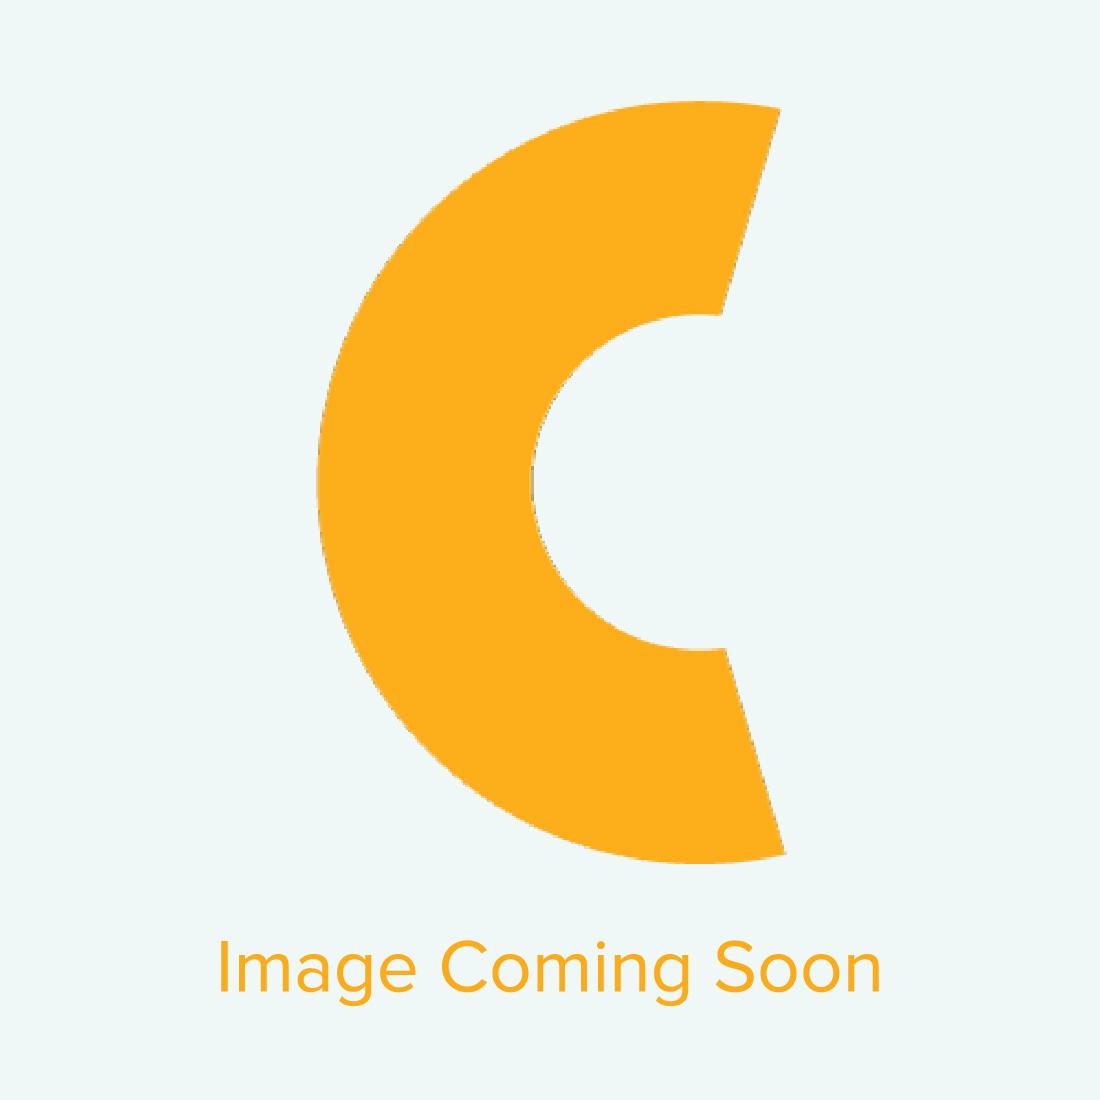 "Heat Transfer Metallic Foil - 12.5"" x 100 feet - Olive Green - OVERSTOCK"